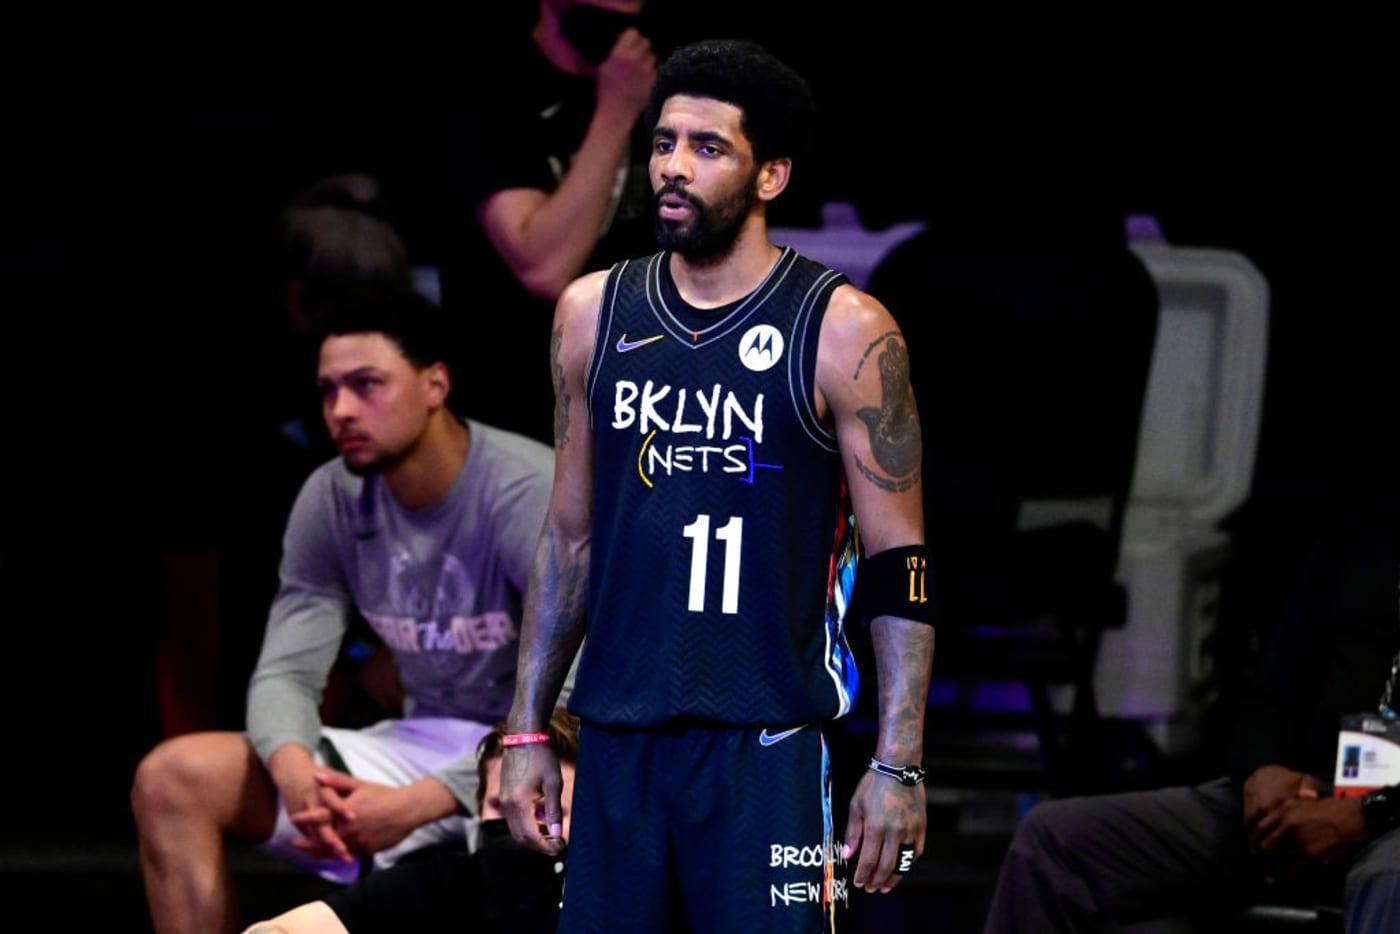 Kyrie Irving Nets Bucks Game 2 2021